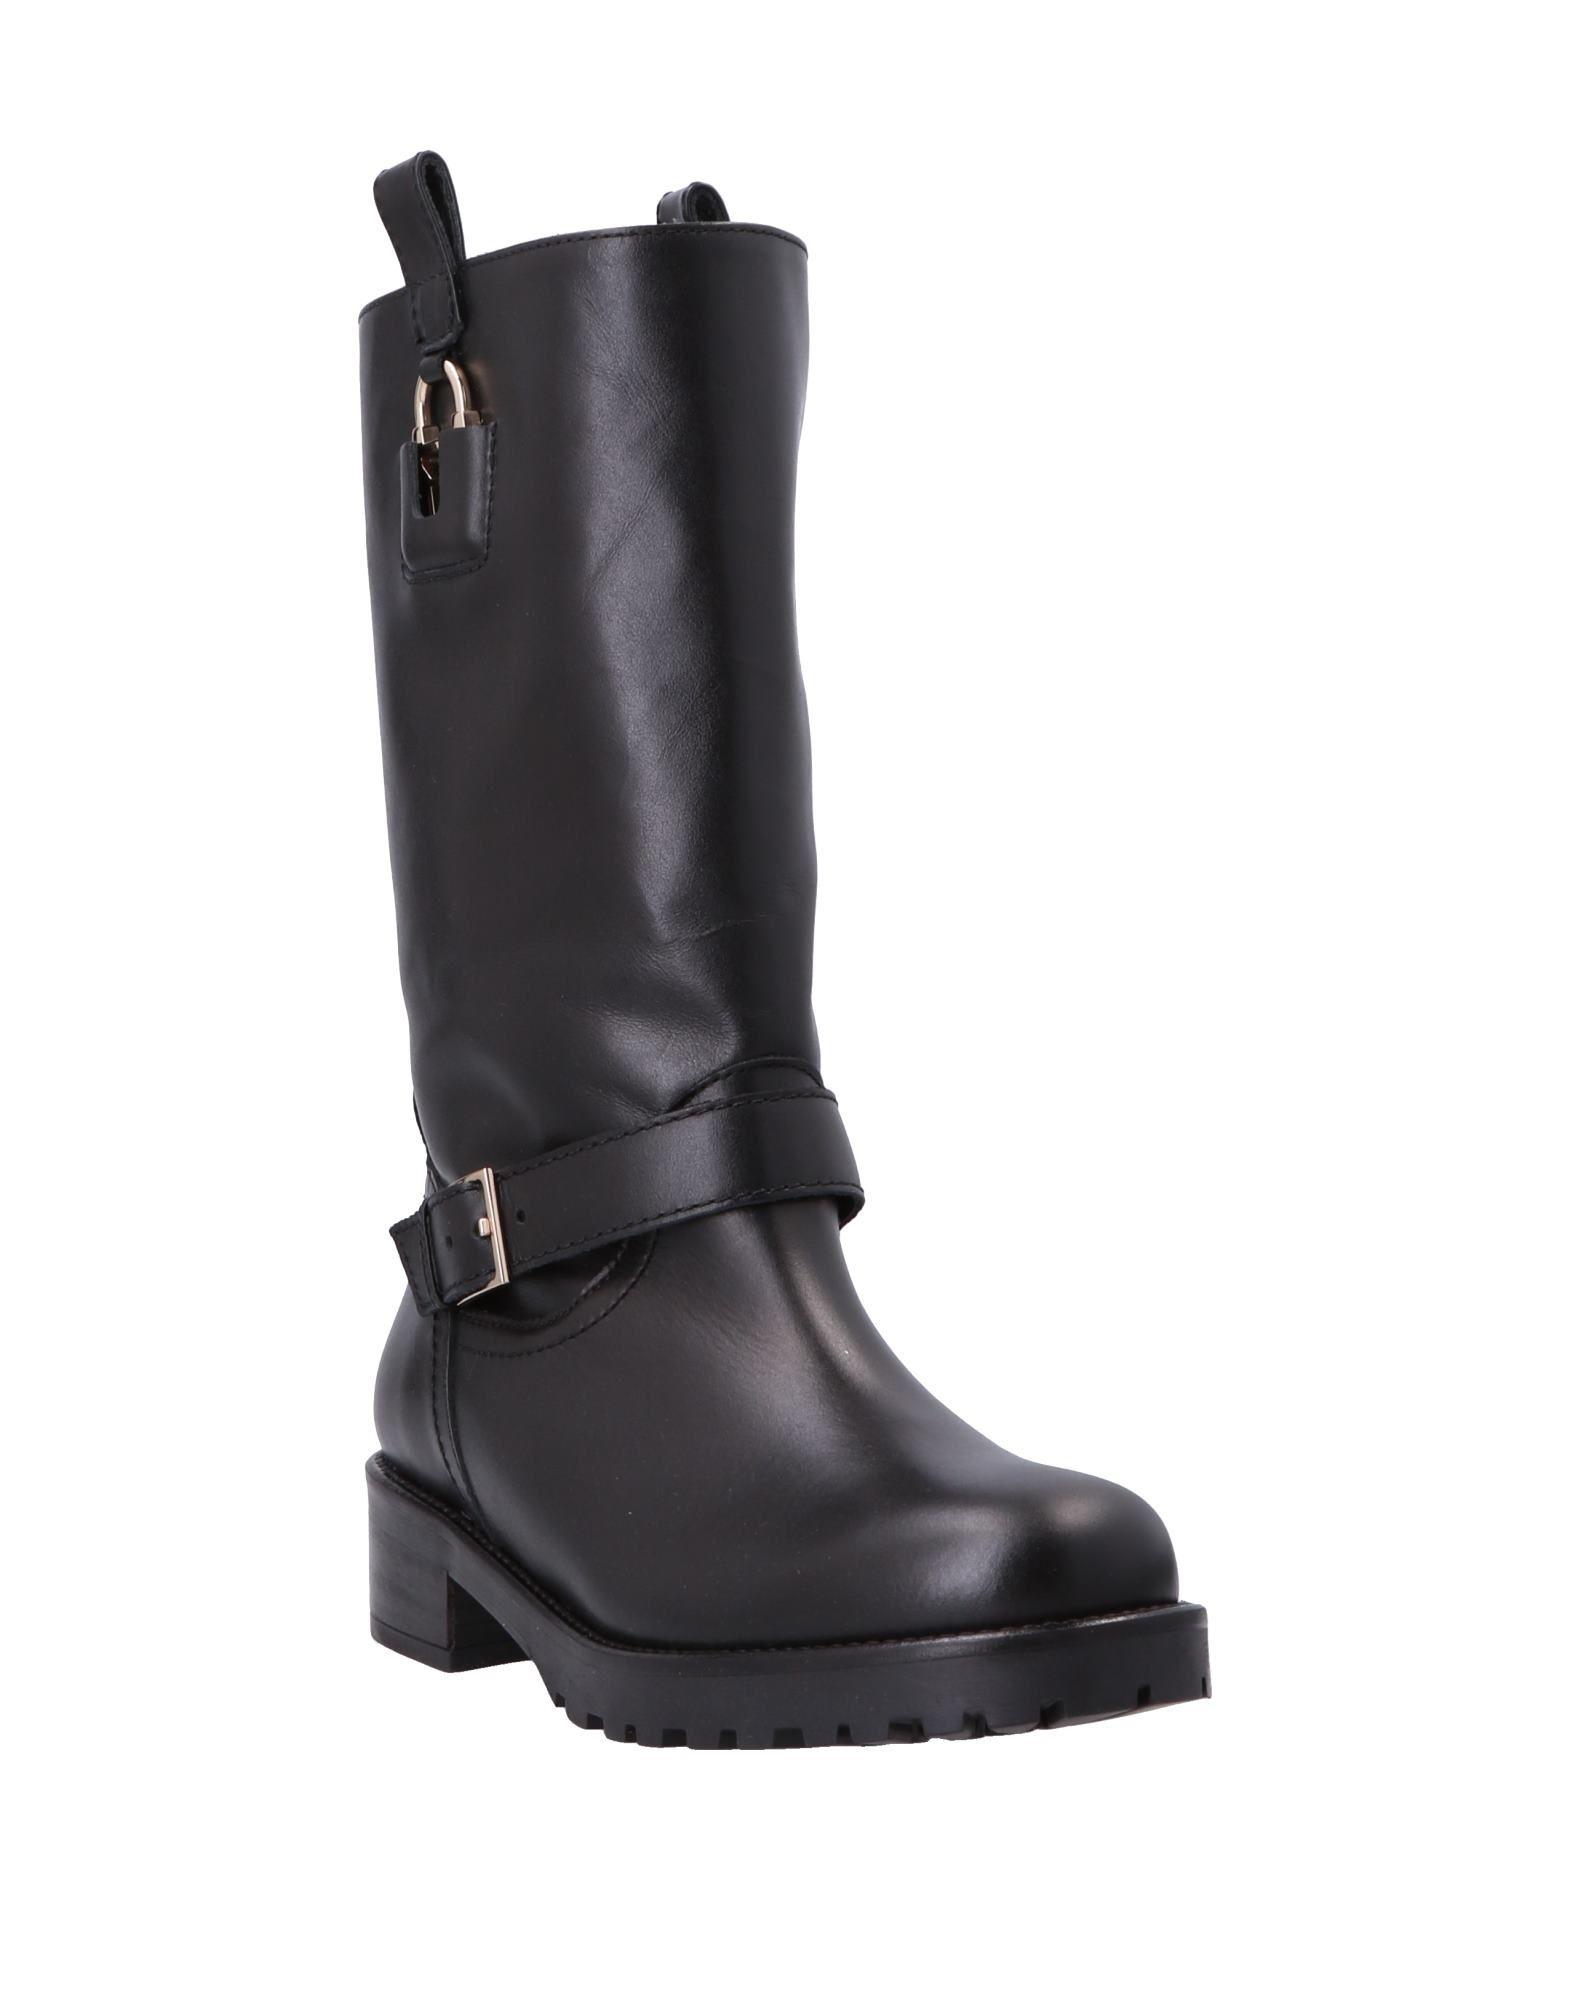 Patrizia Pepe 11527070GPGut Stiefelette Damen  11527070GPGut Pepe aussehende strapazierfähige Schuhe 4ca3f0